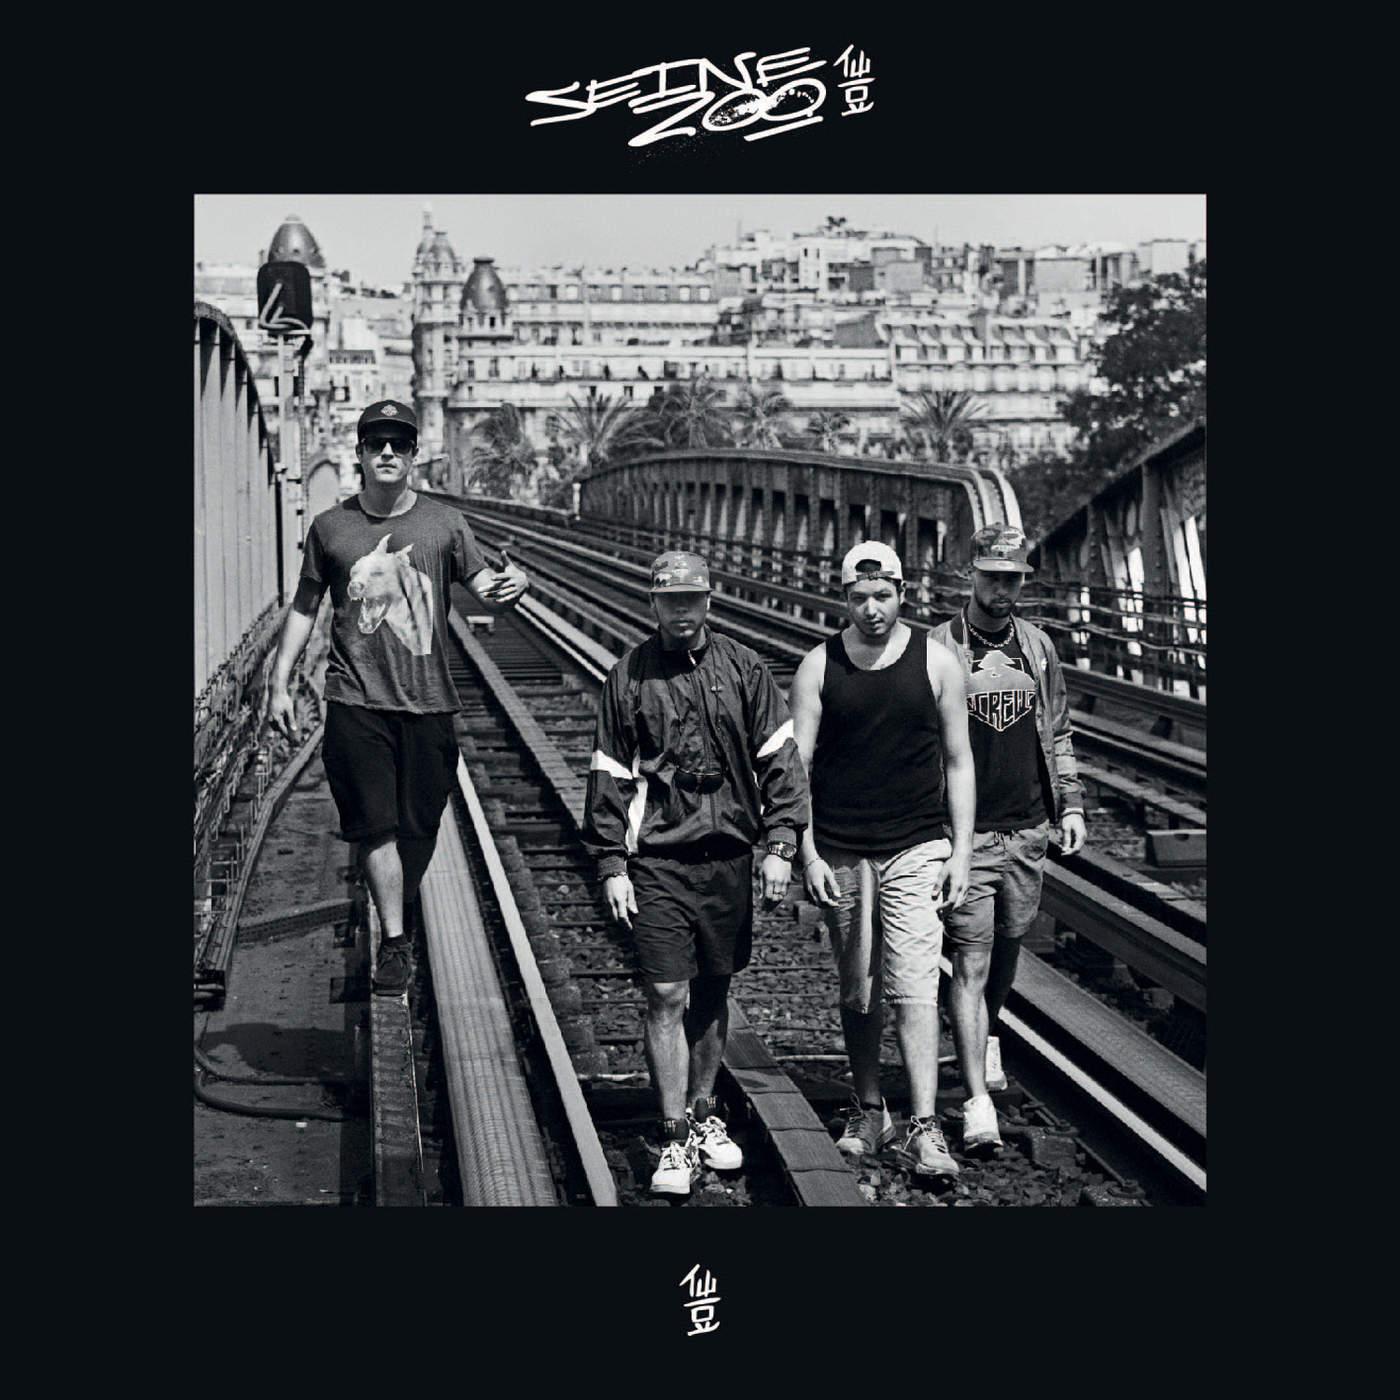 S-Crew - Seine Zoo Cover